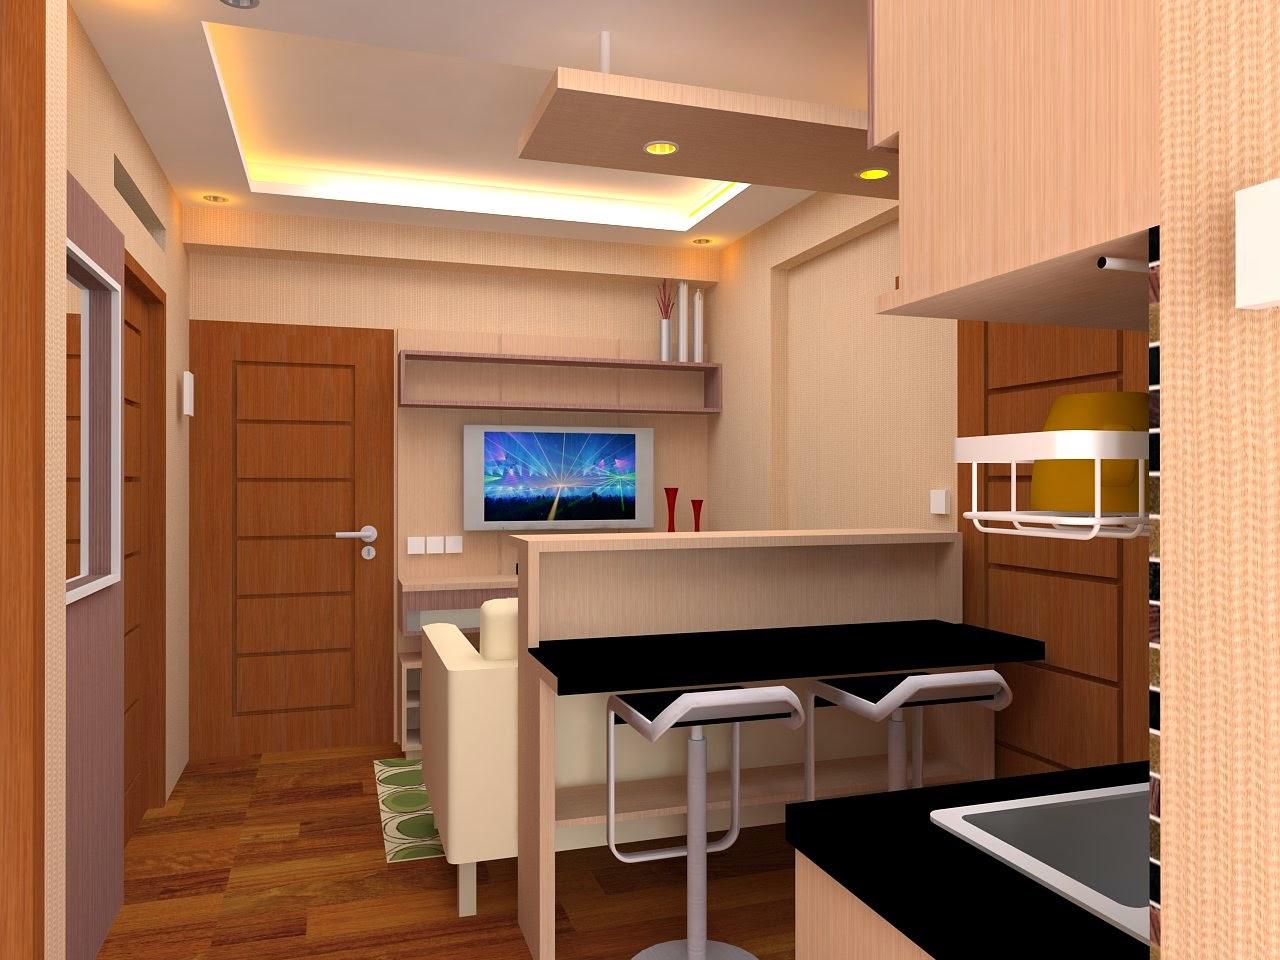 Desain Interior Apartemen Tempat Tinggal Kantor Tempat Usaha